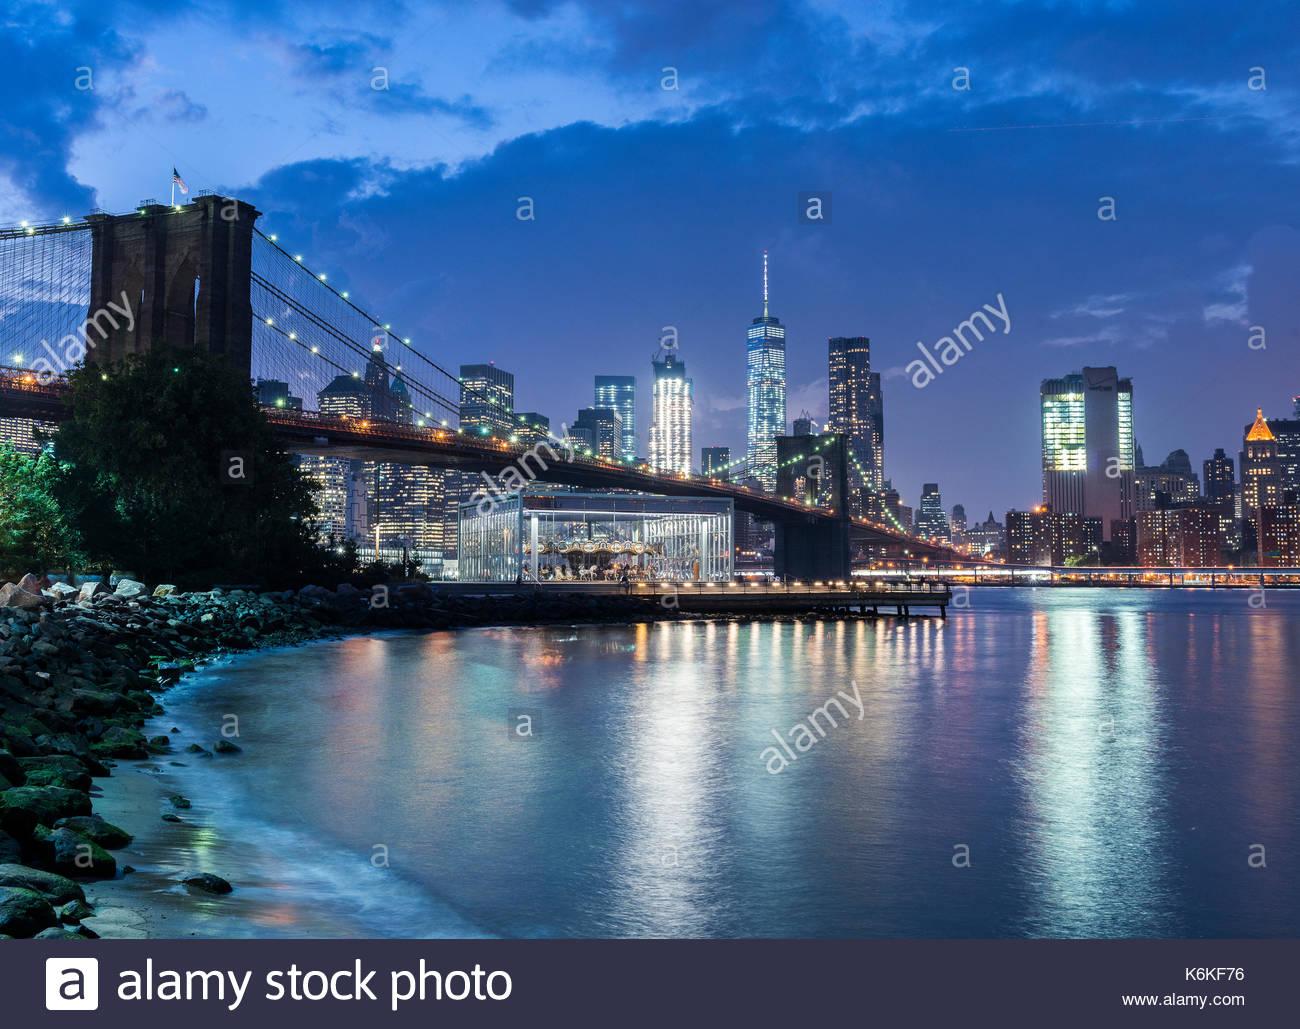 Brooklyn Brooklyn Bridge Park, New York, USA. Stockbild